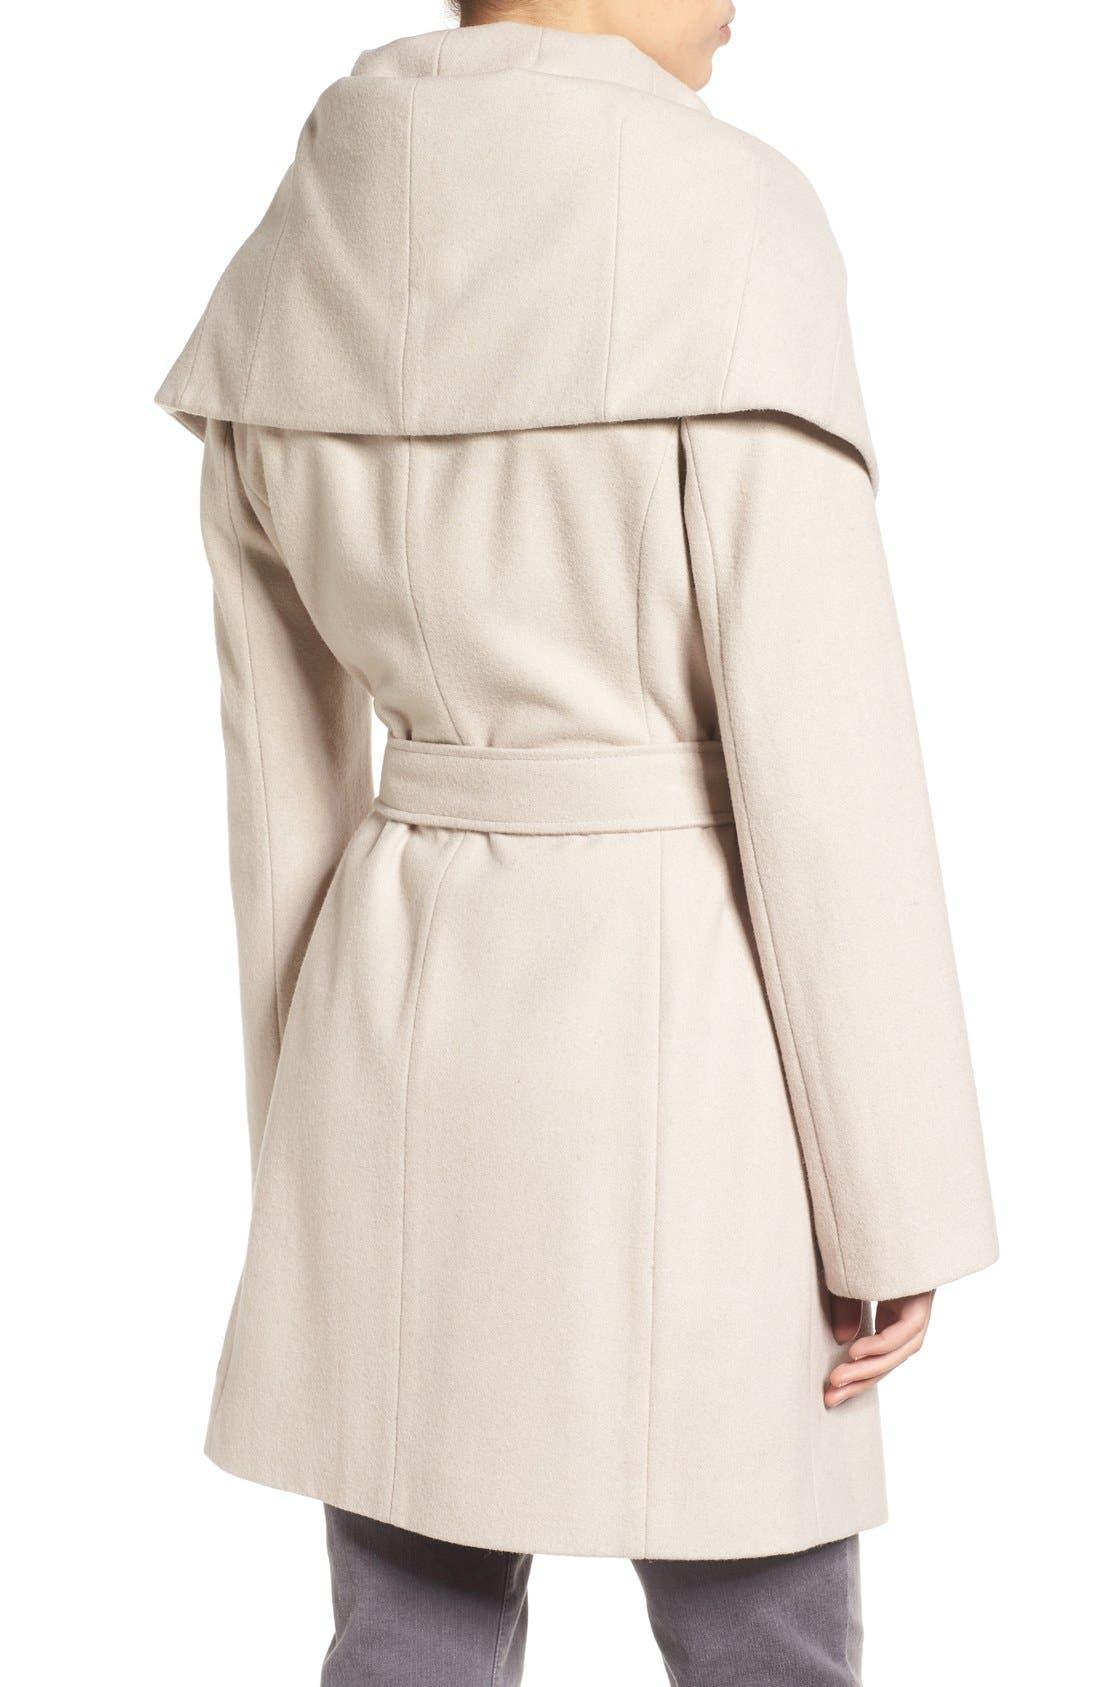 T Tahari Wool Blend Belted Wrap Coat,                             Alternate thumbnail 27, color,